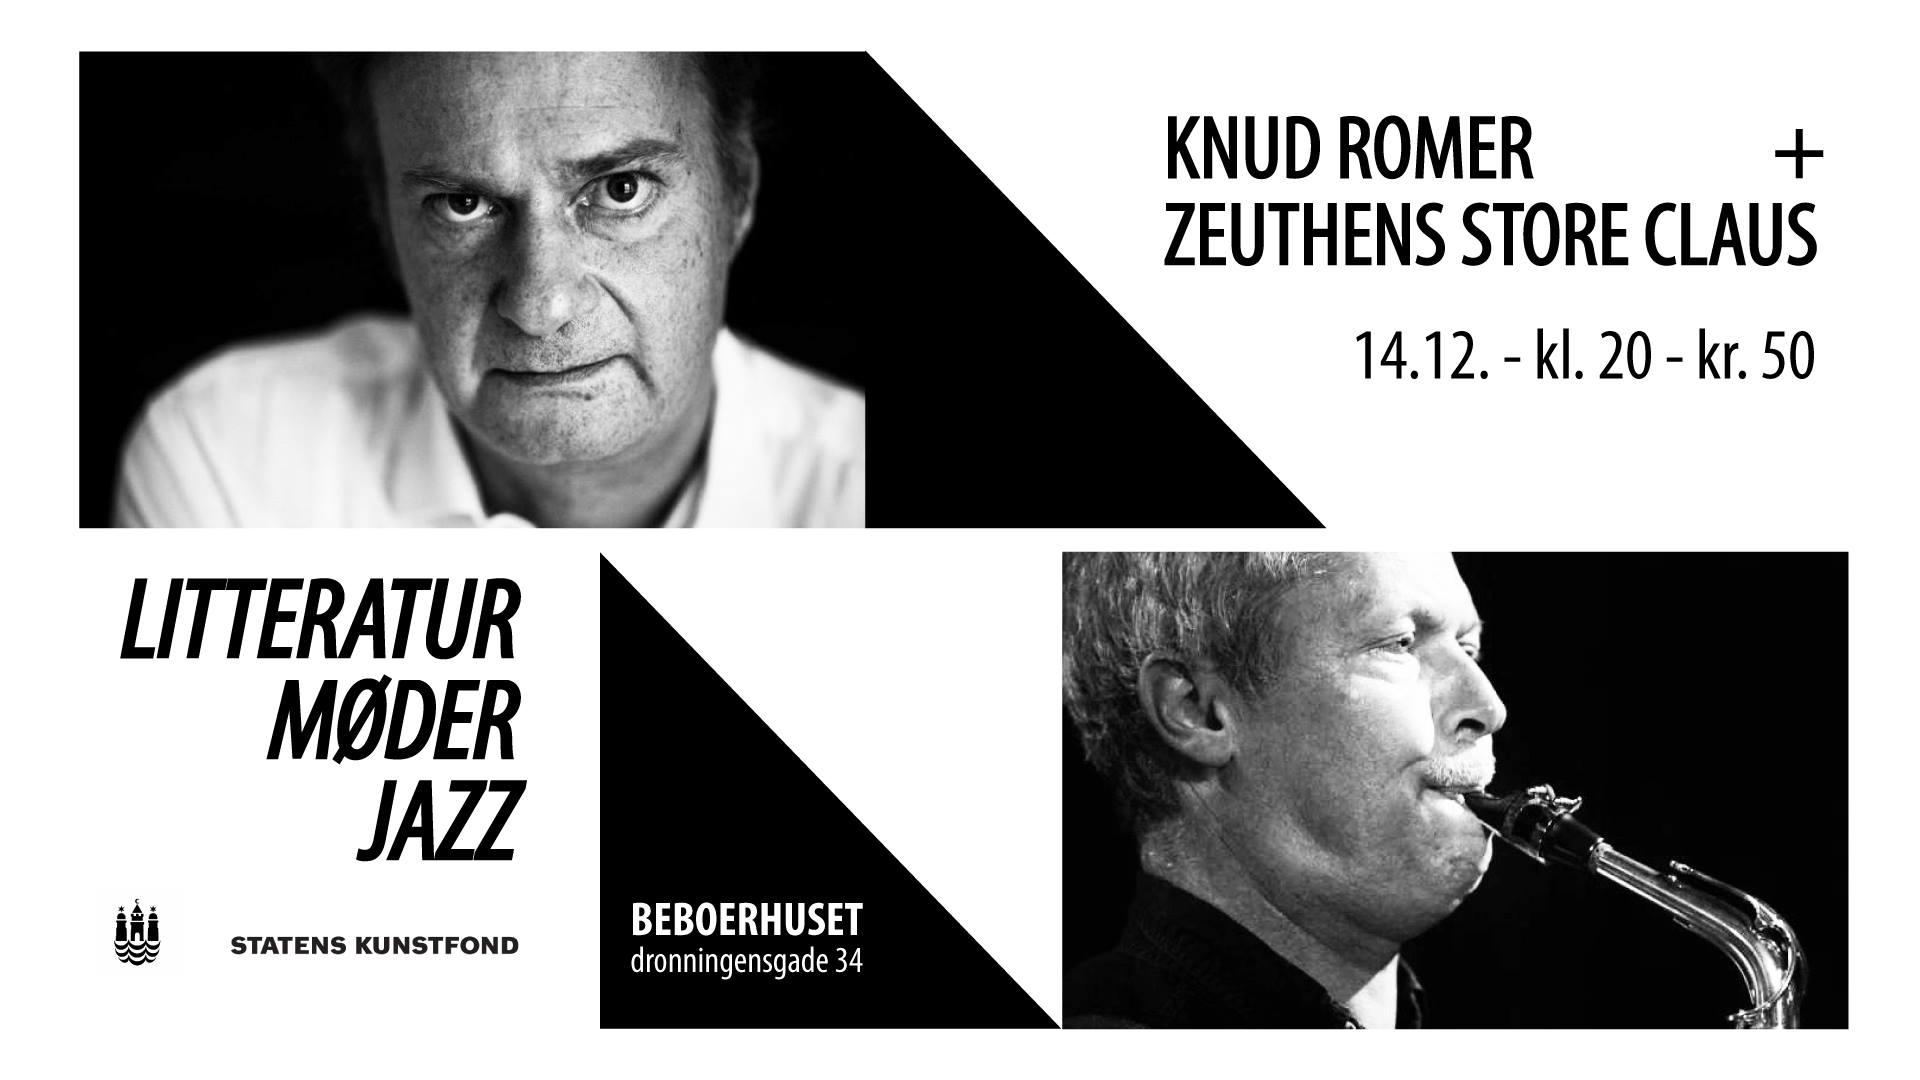 Litteratur møder Jazz – Knud Romer + Zeuthens Store Claus